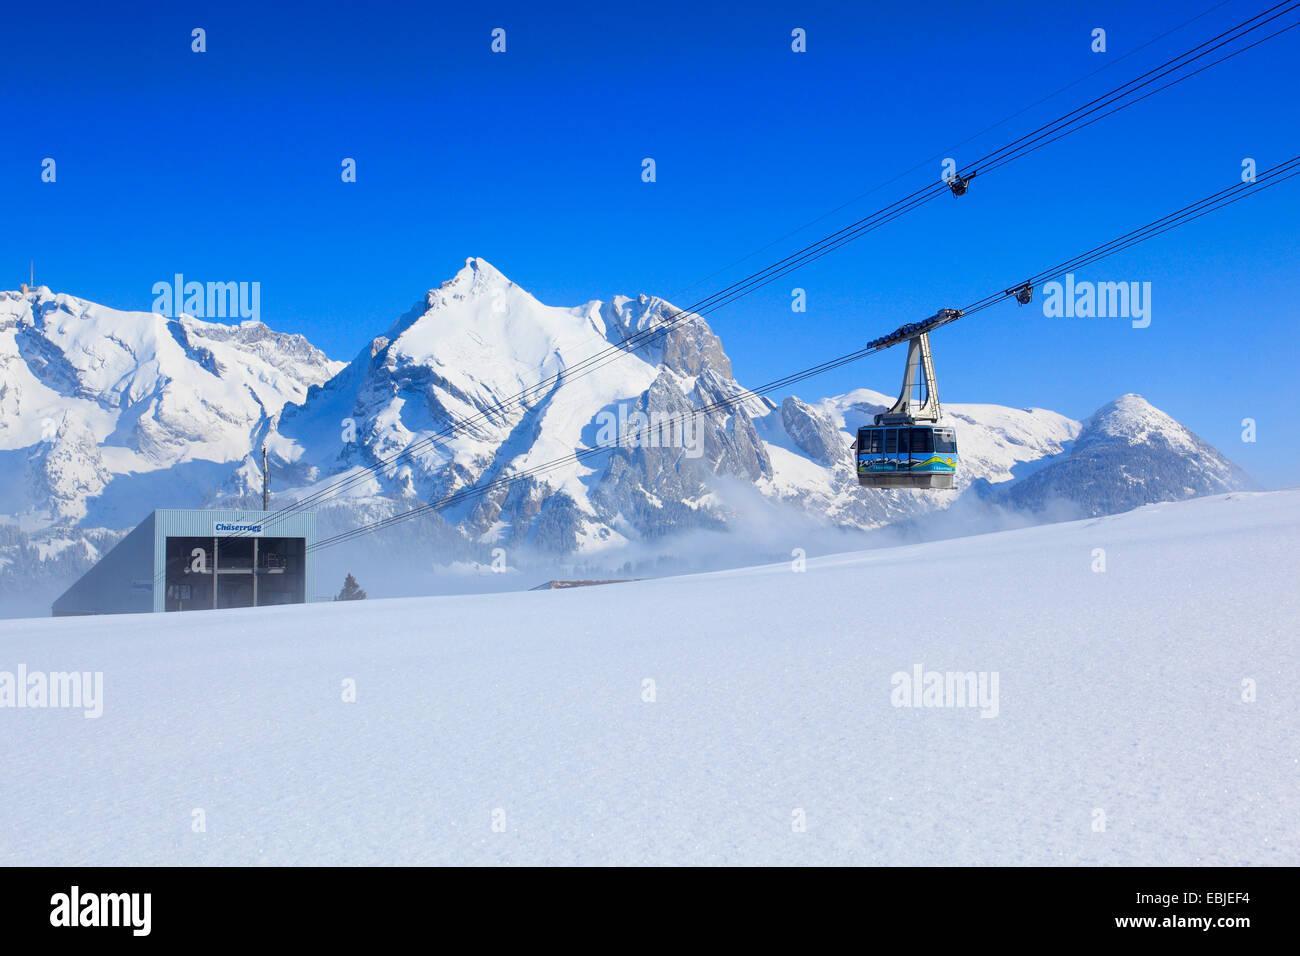 Iltios�Chaeserrugg cableway in winter, Switzerland, Appenzell, Toggenburg - Stock Image